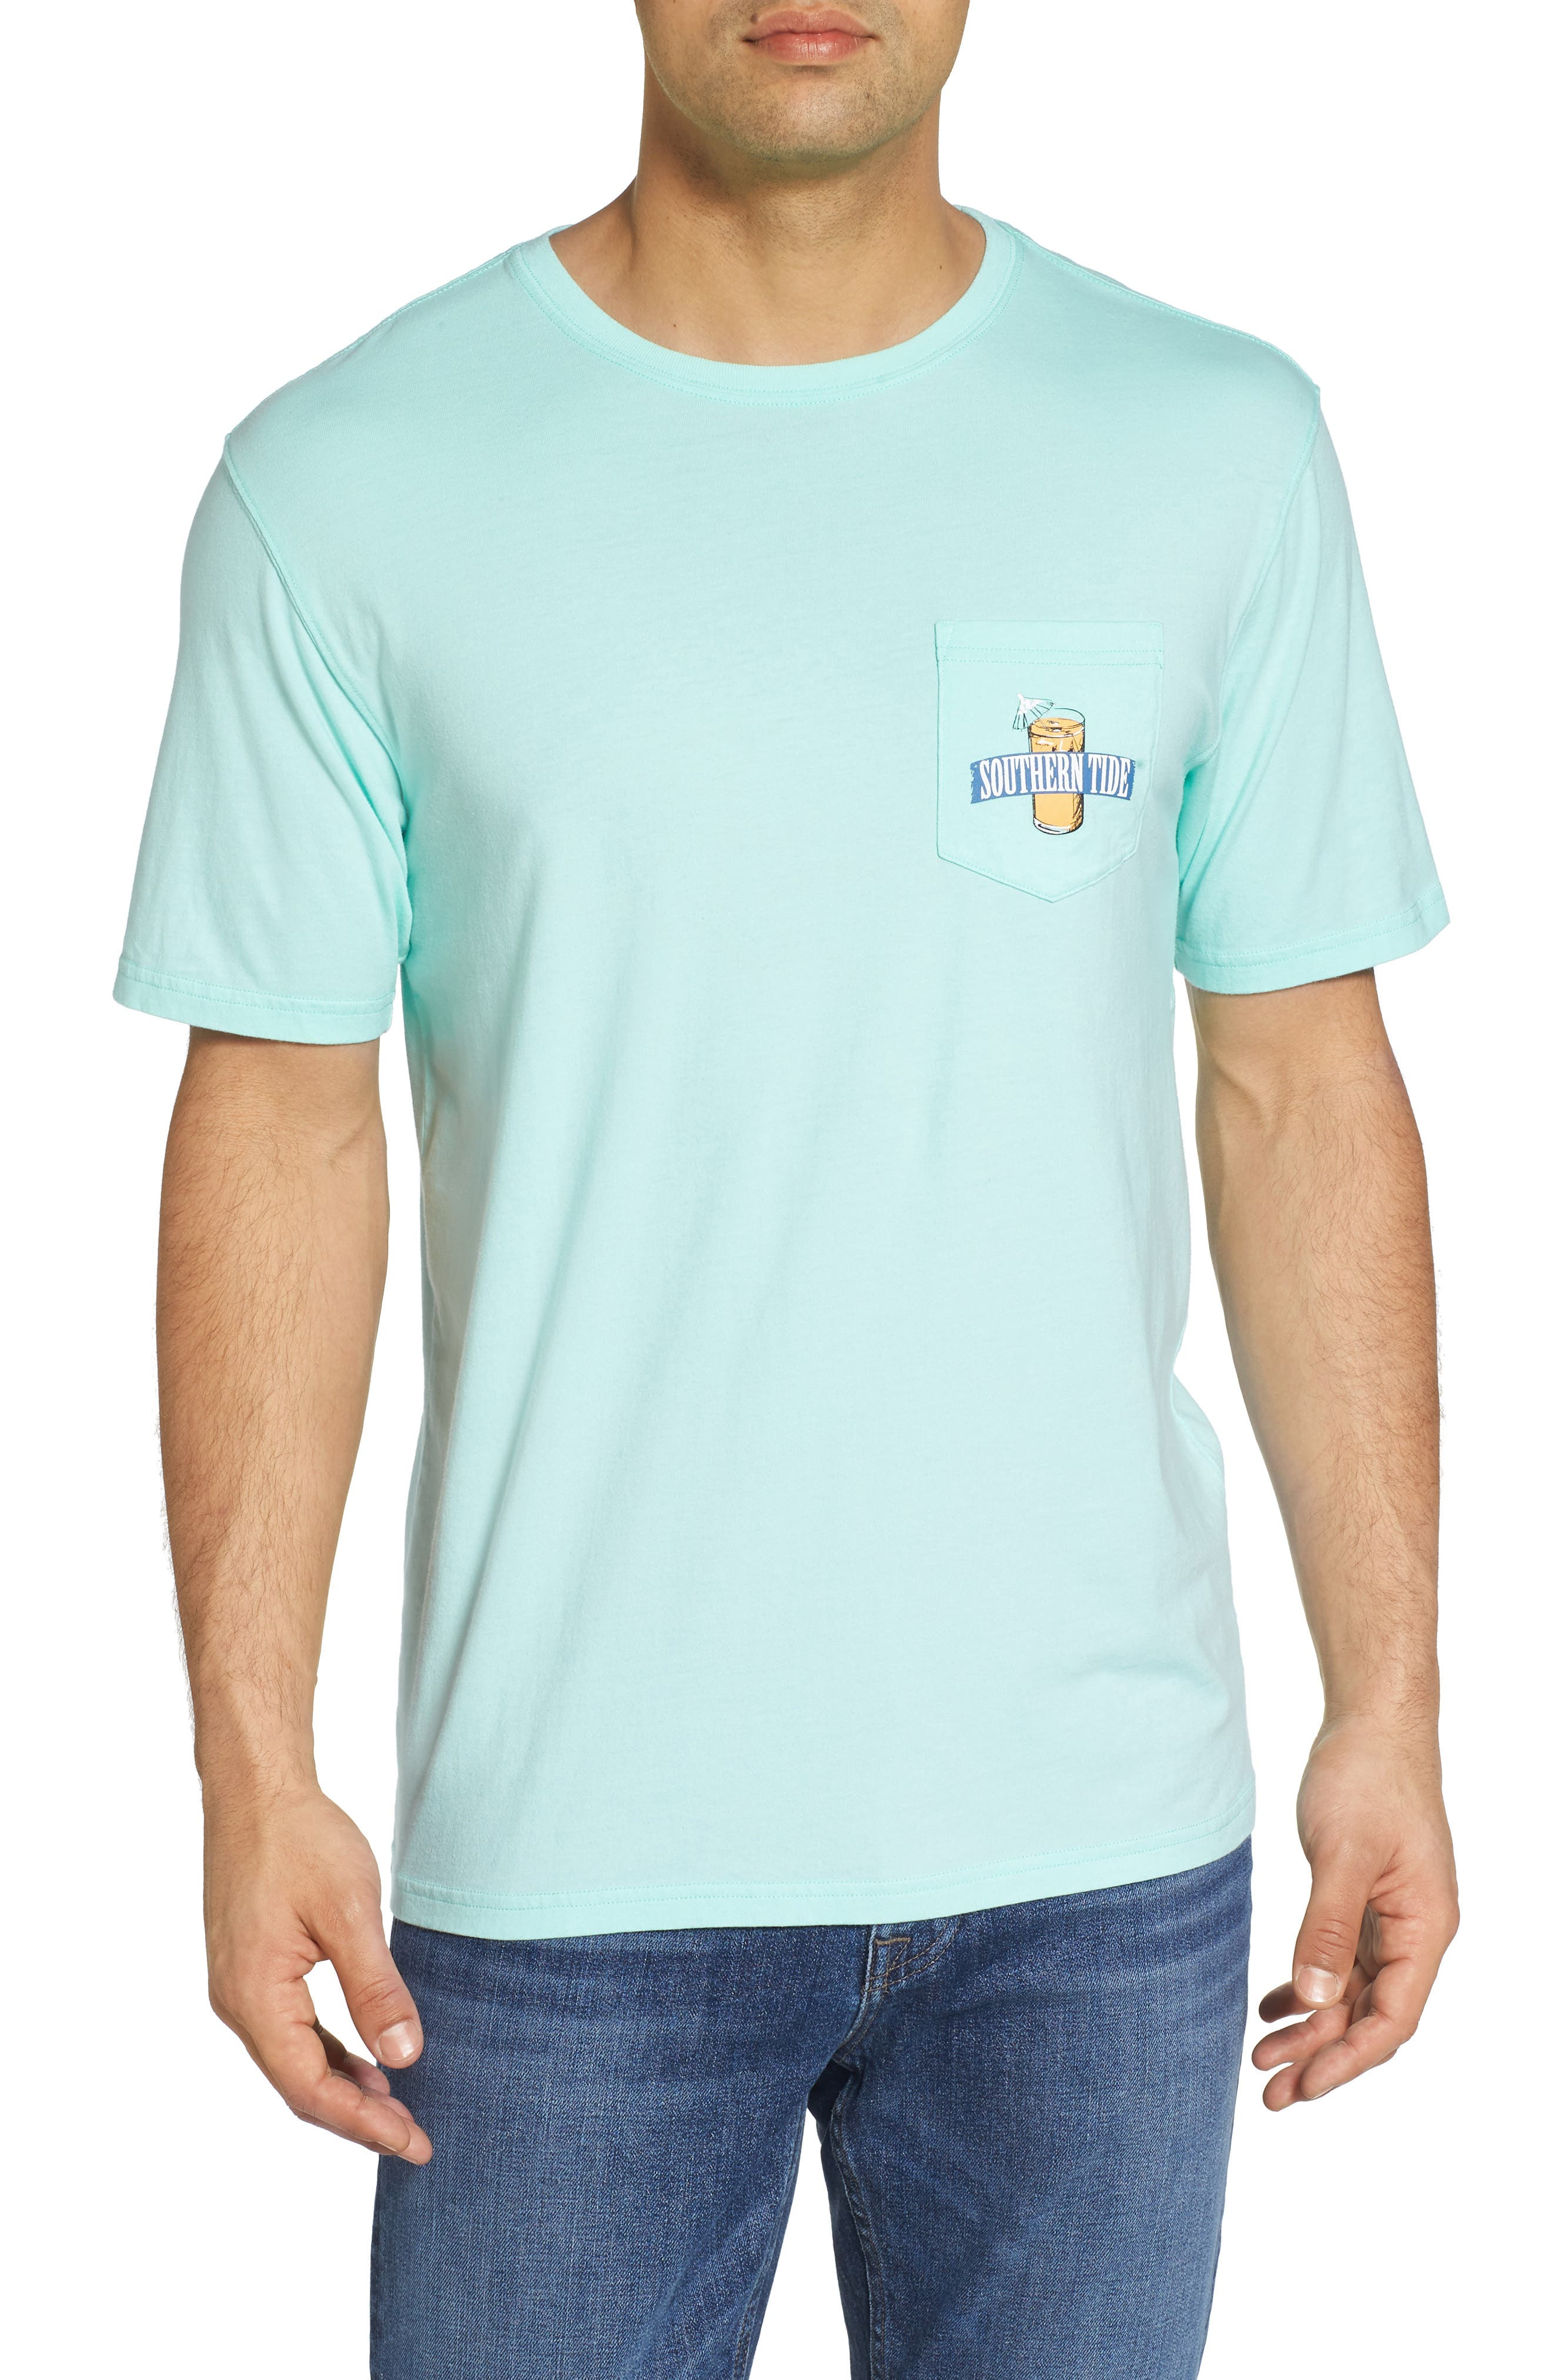 Southern Mix Crewneck T-Shirt,                             Main thumbnail 1, color,                             376